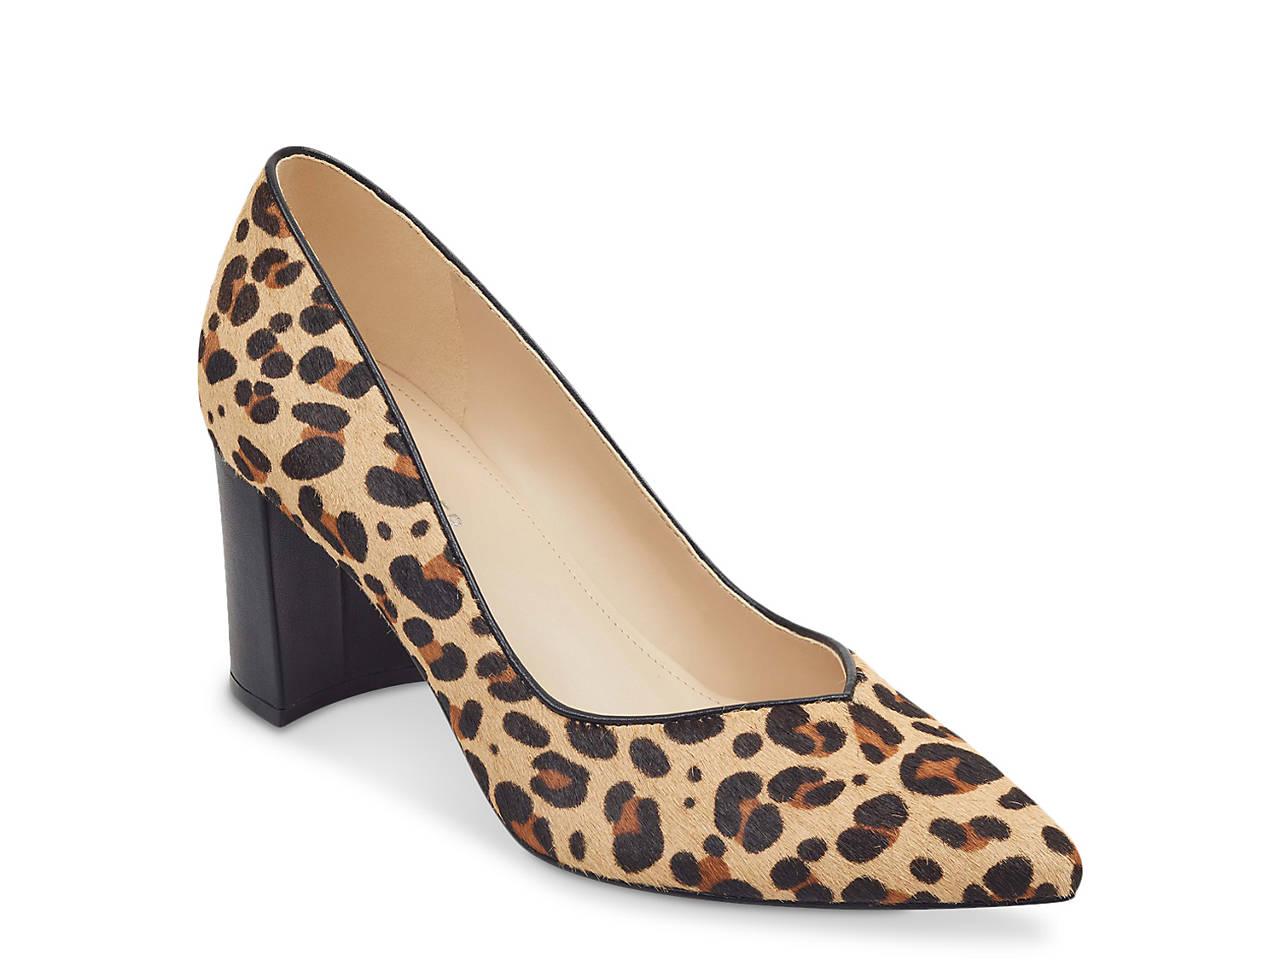 b60eeb3f5ba8 Marc Fisher Caitlin Pump Women s Shoes